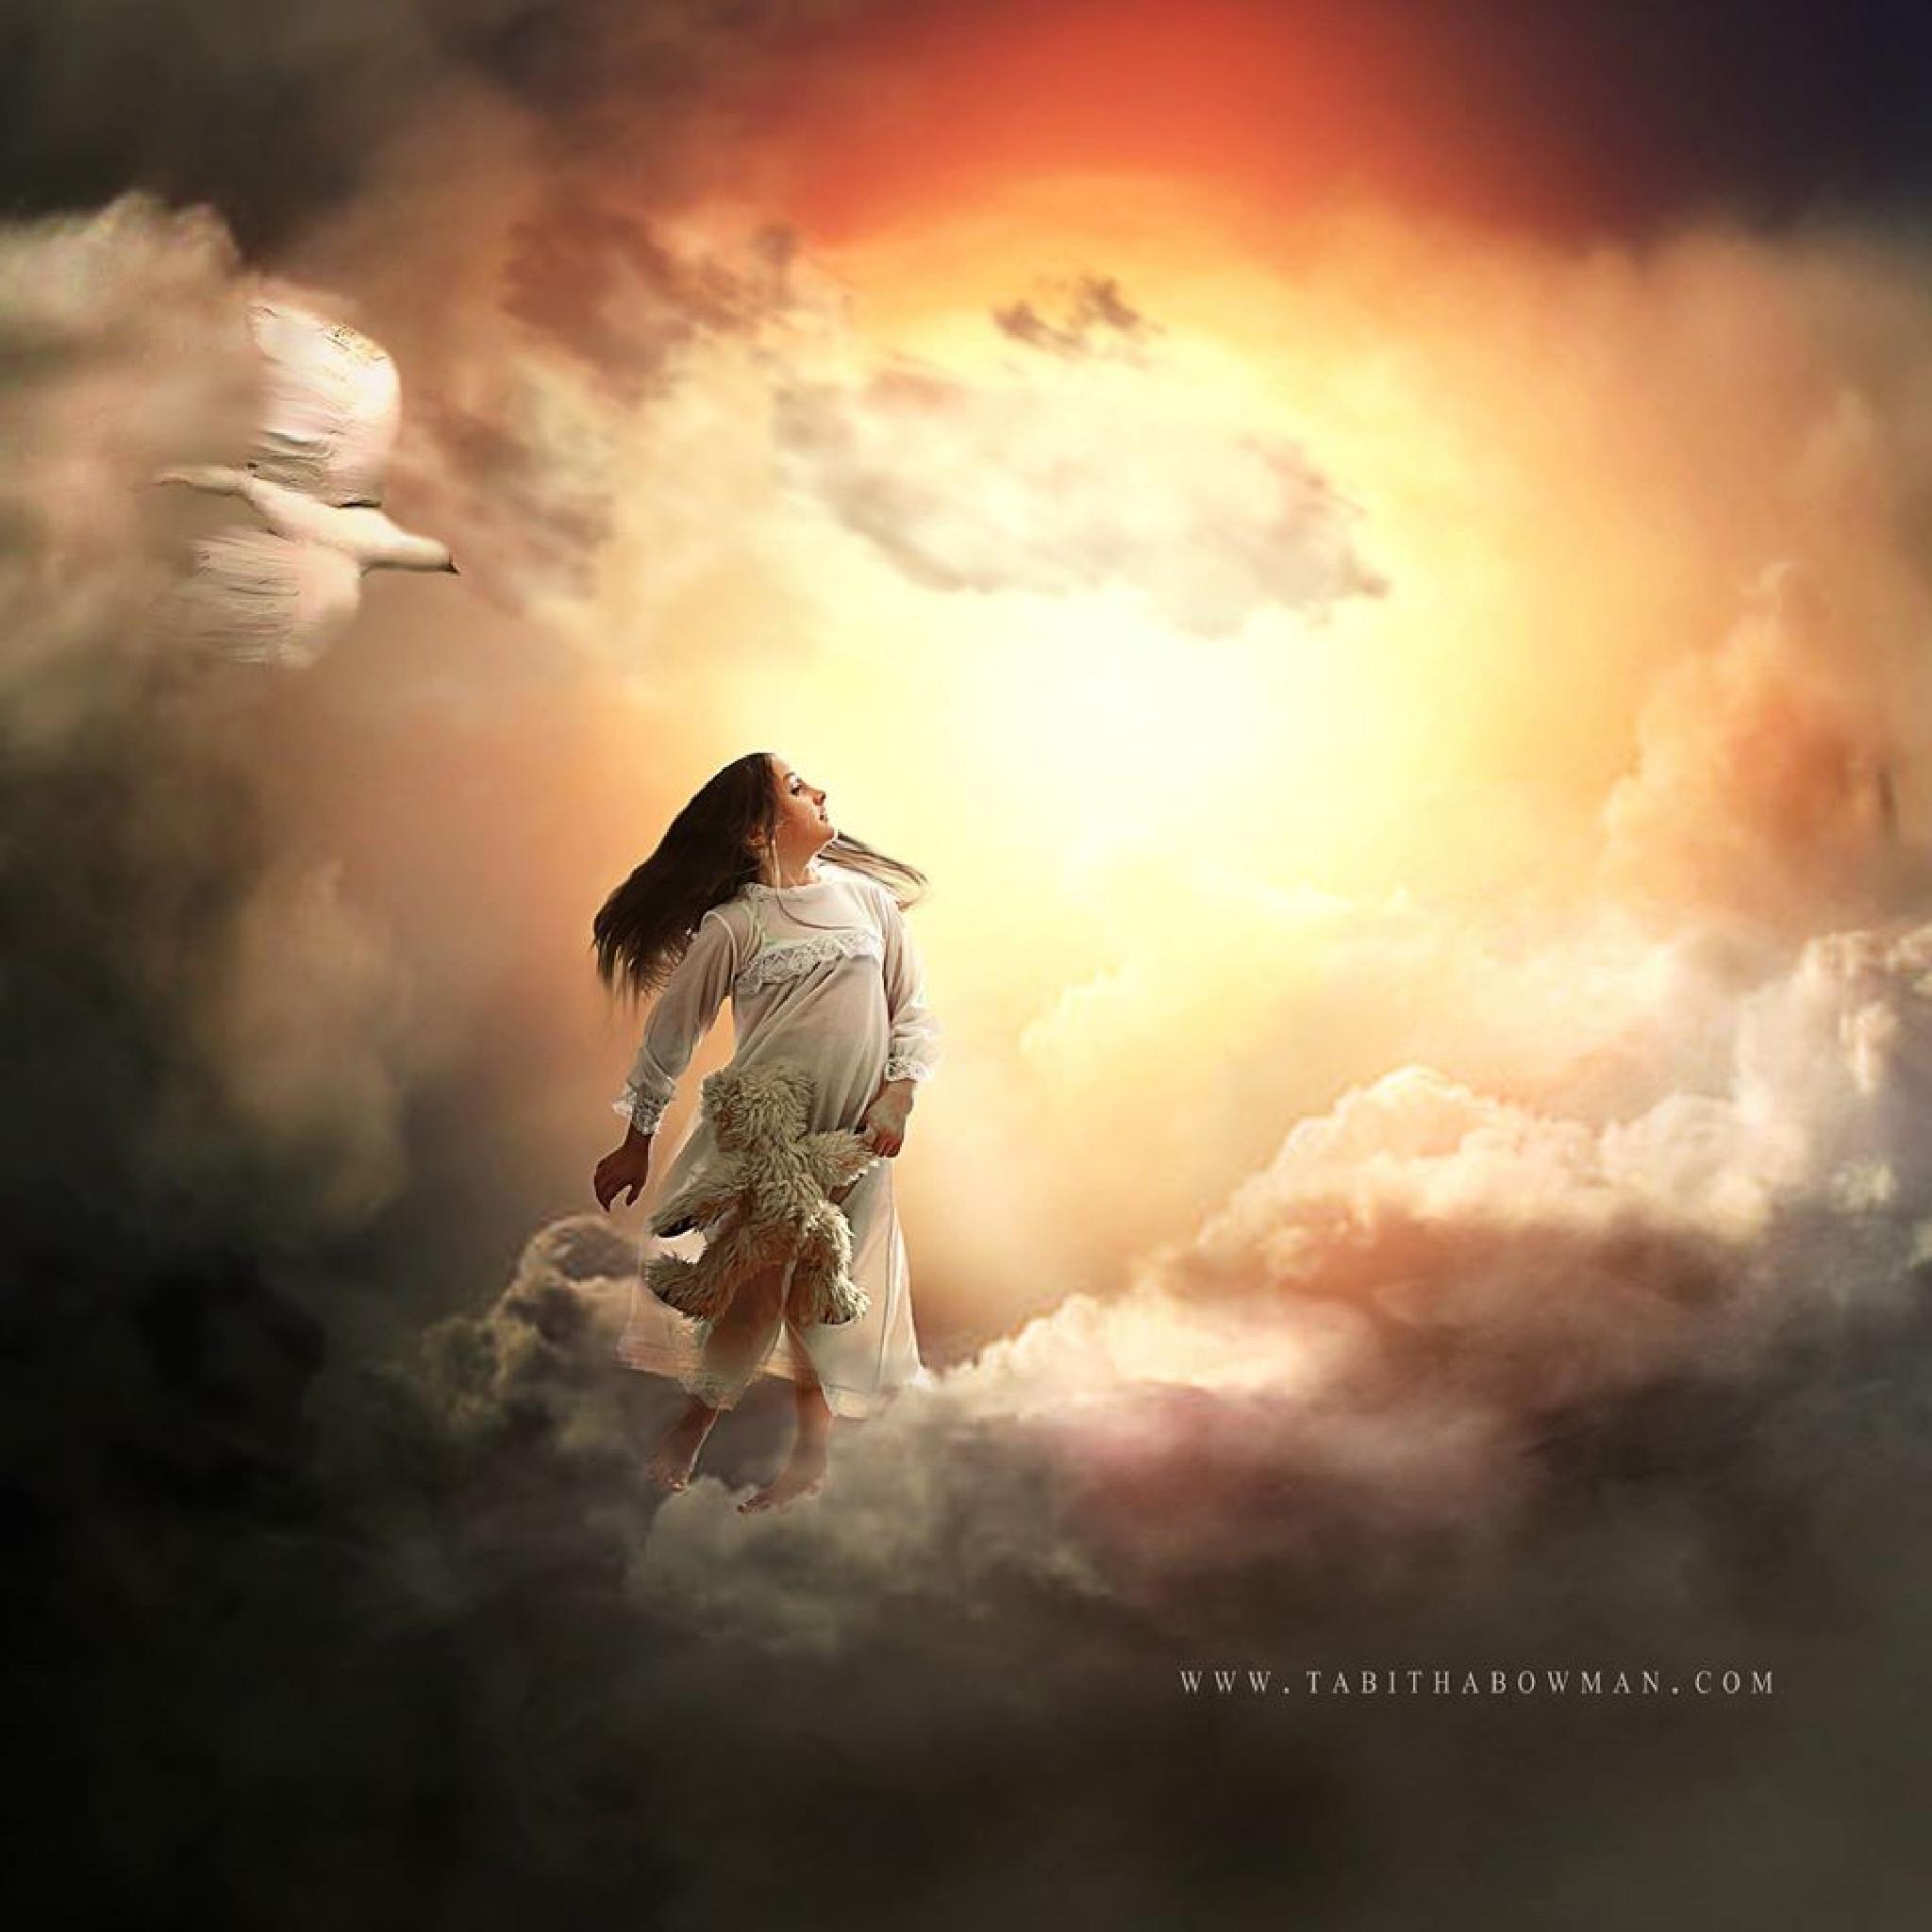 heavenly by Tabitha Bowman